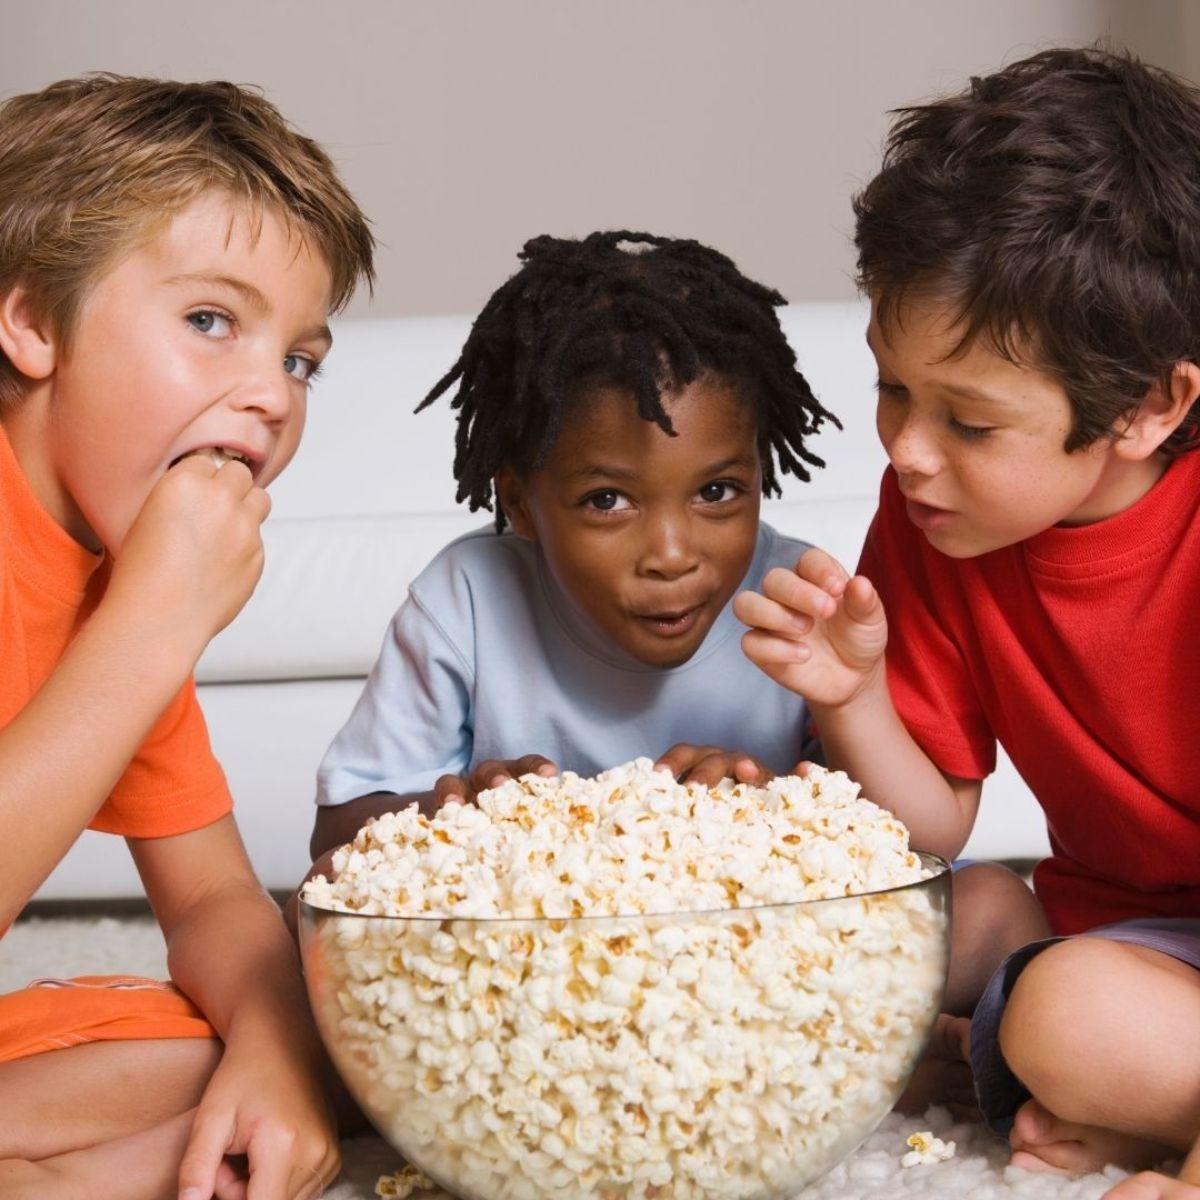 3 boys gather around a glass bowl full of popcorn